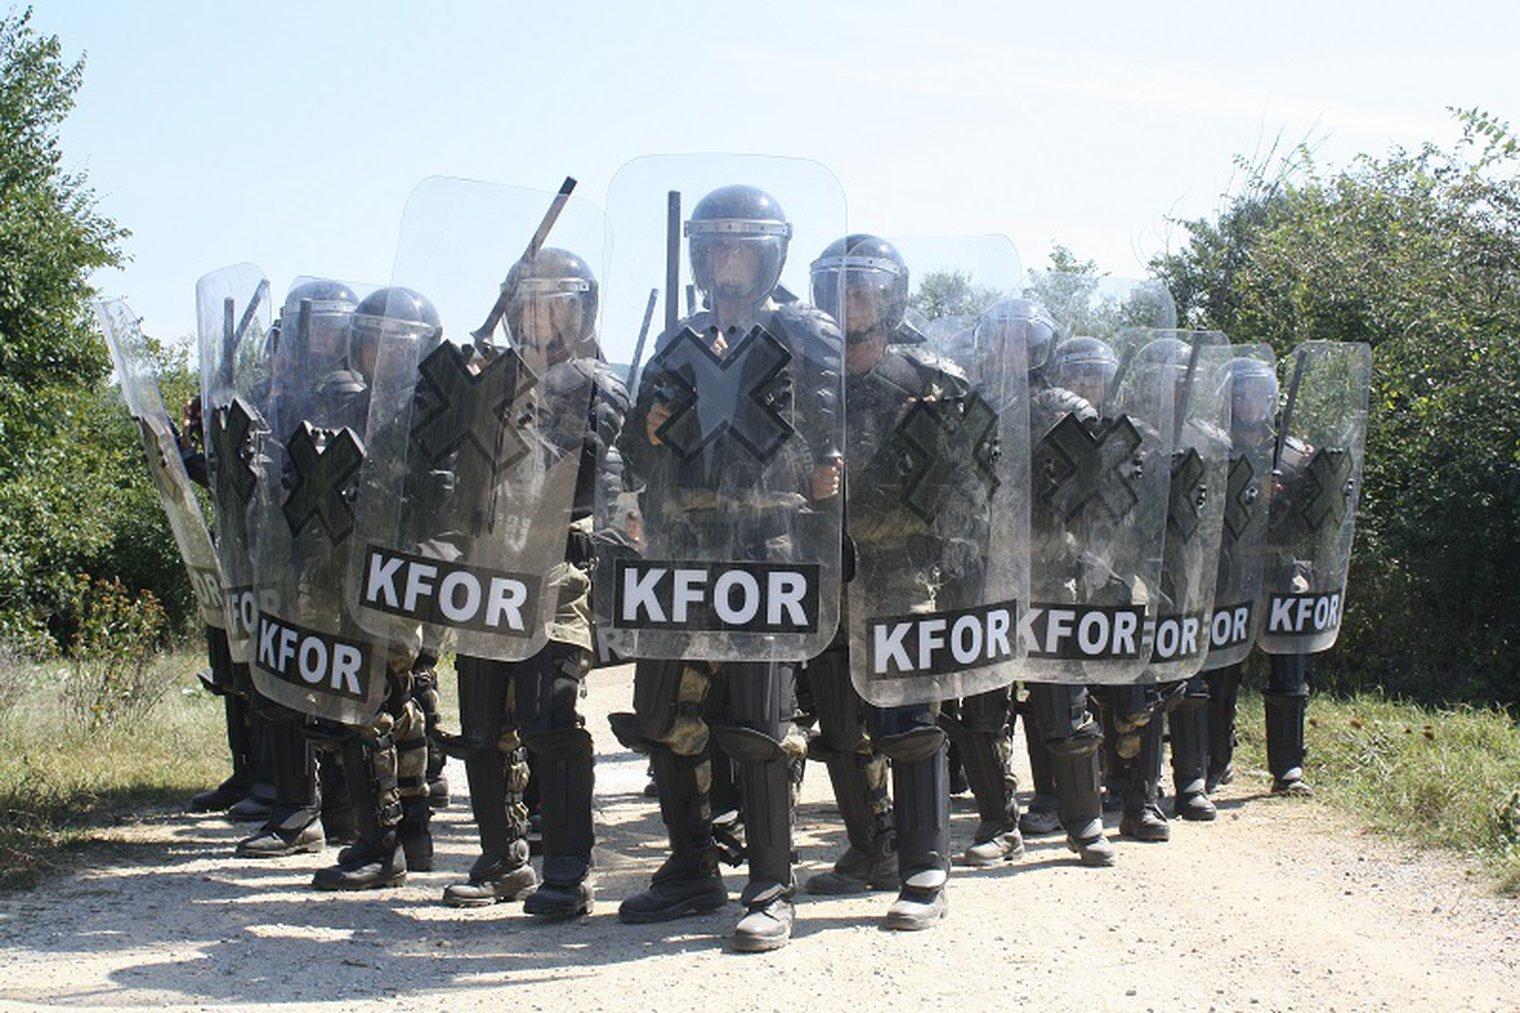 US backs Kosovo's plan to create an army - LWI - Land